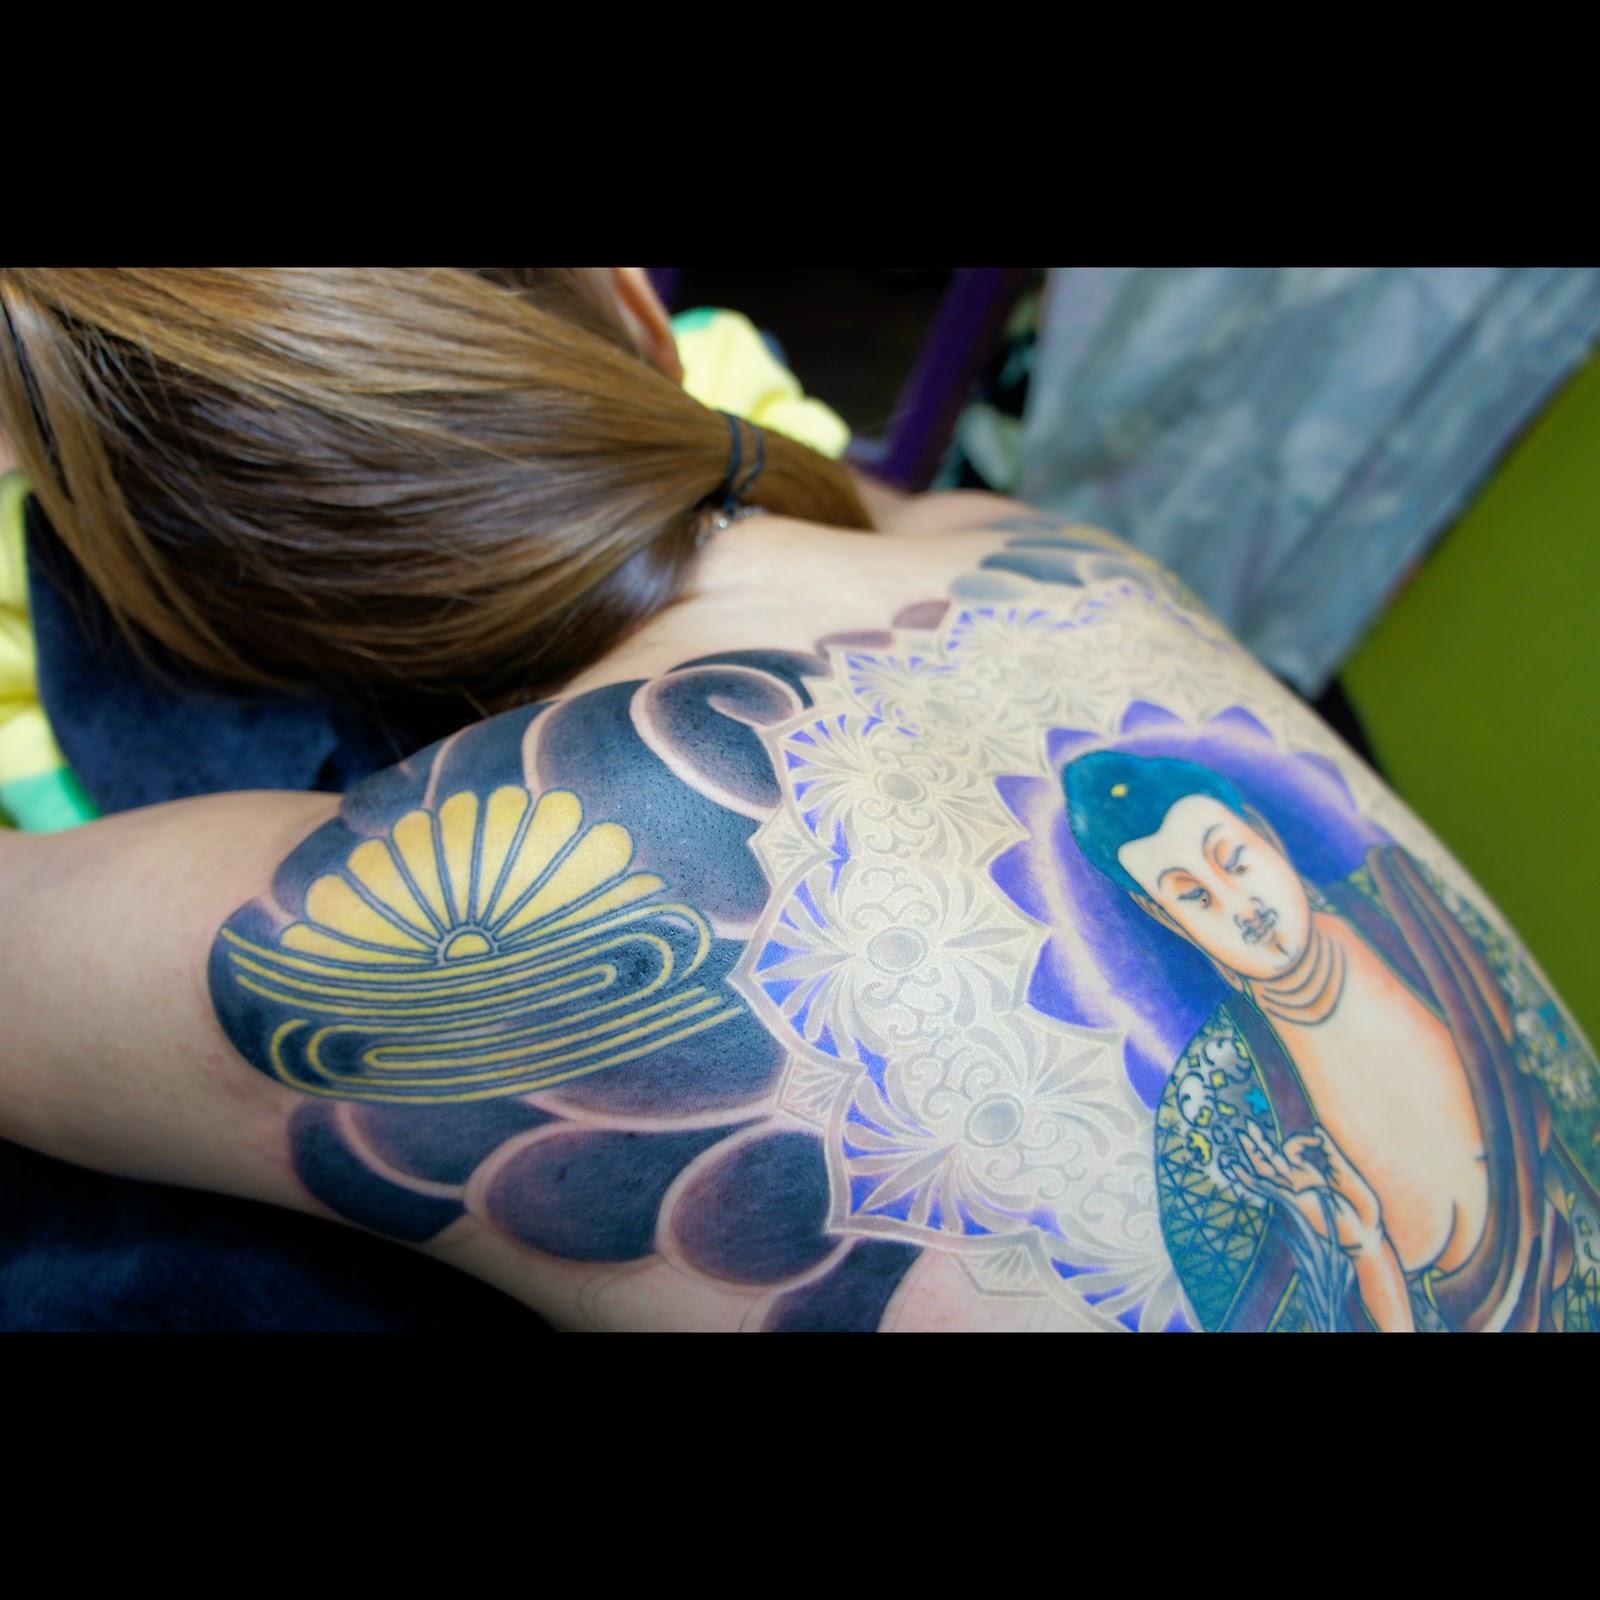 タトゥー TATTOO  刺青 和彫 額 阿弥陀如来